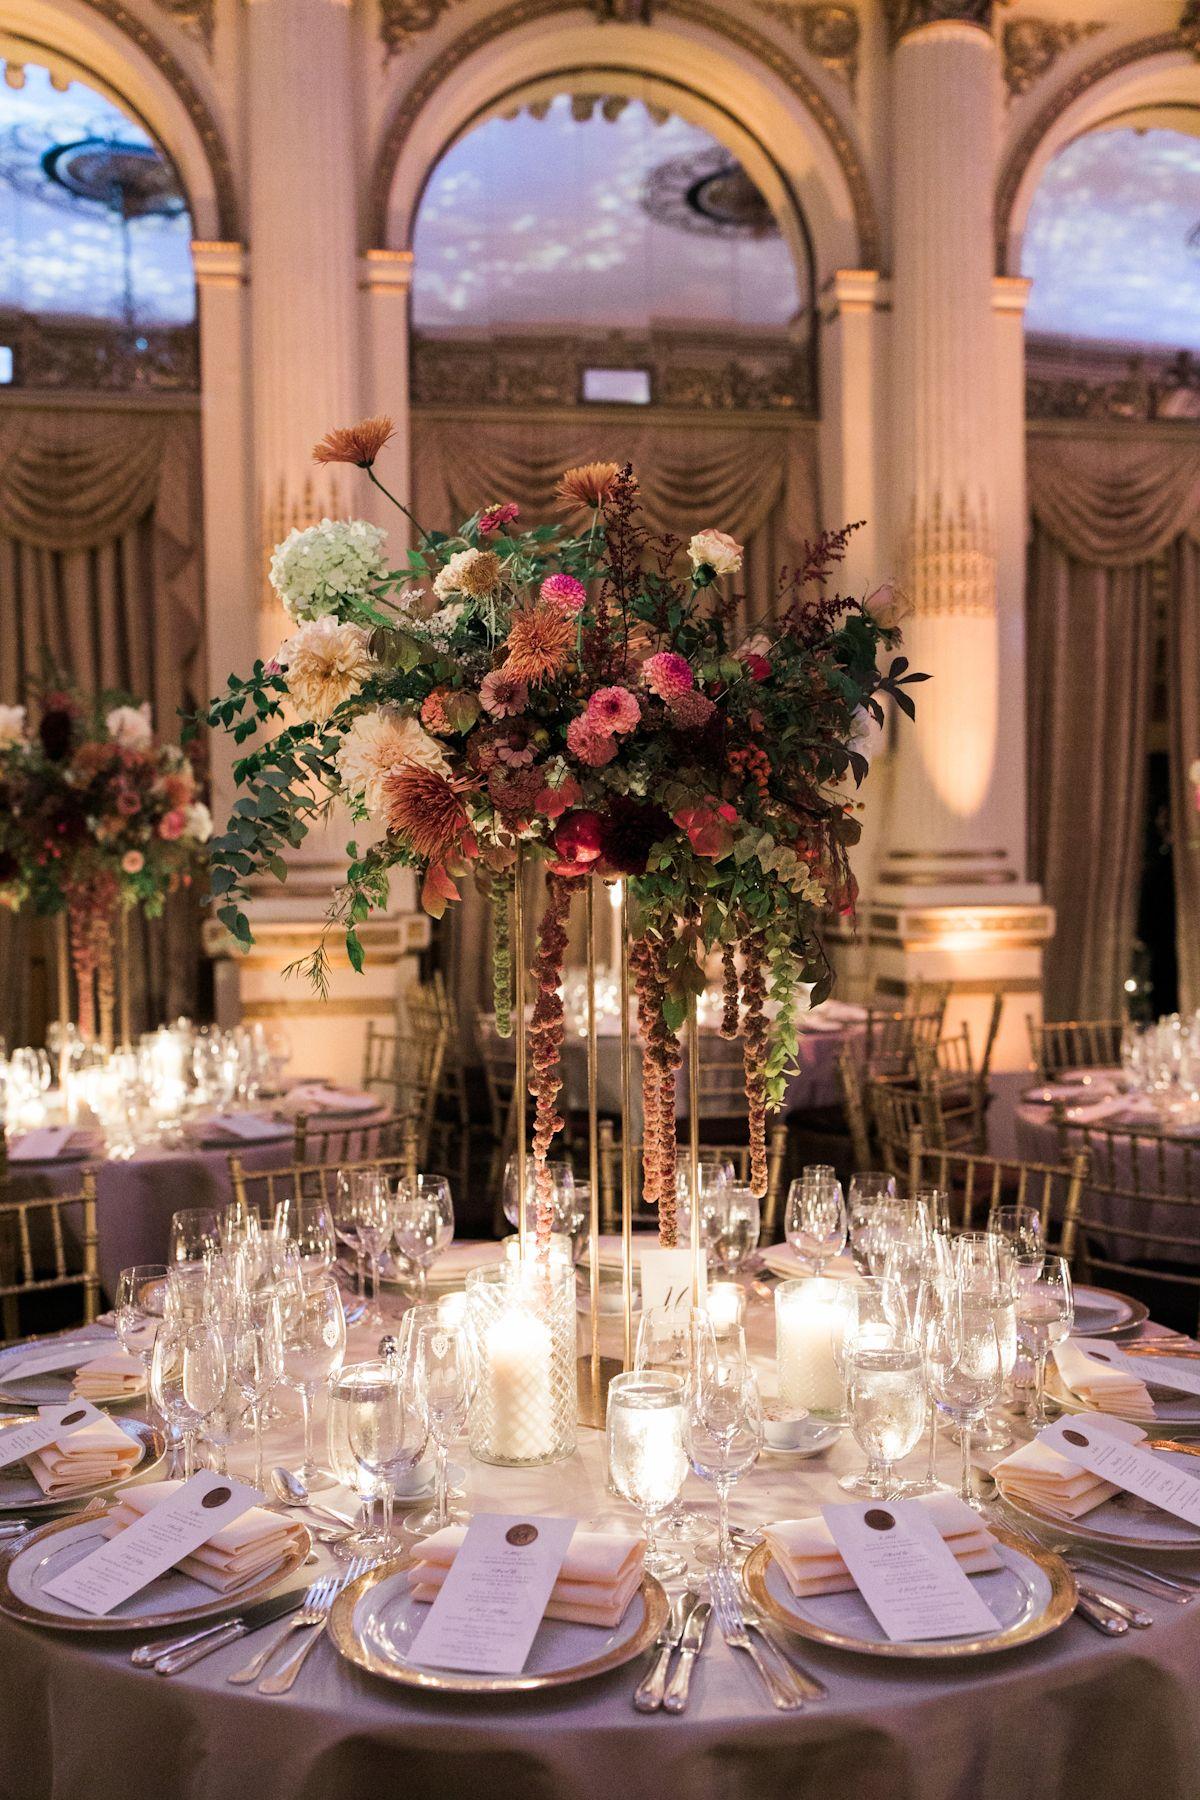 The Plaza Hotel Wedding, NY Hotel wedding receptions